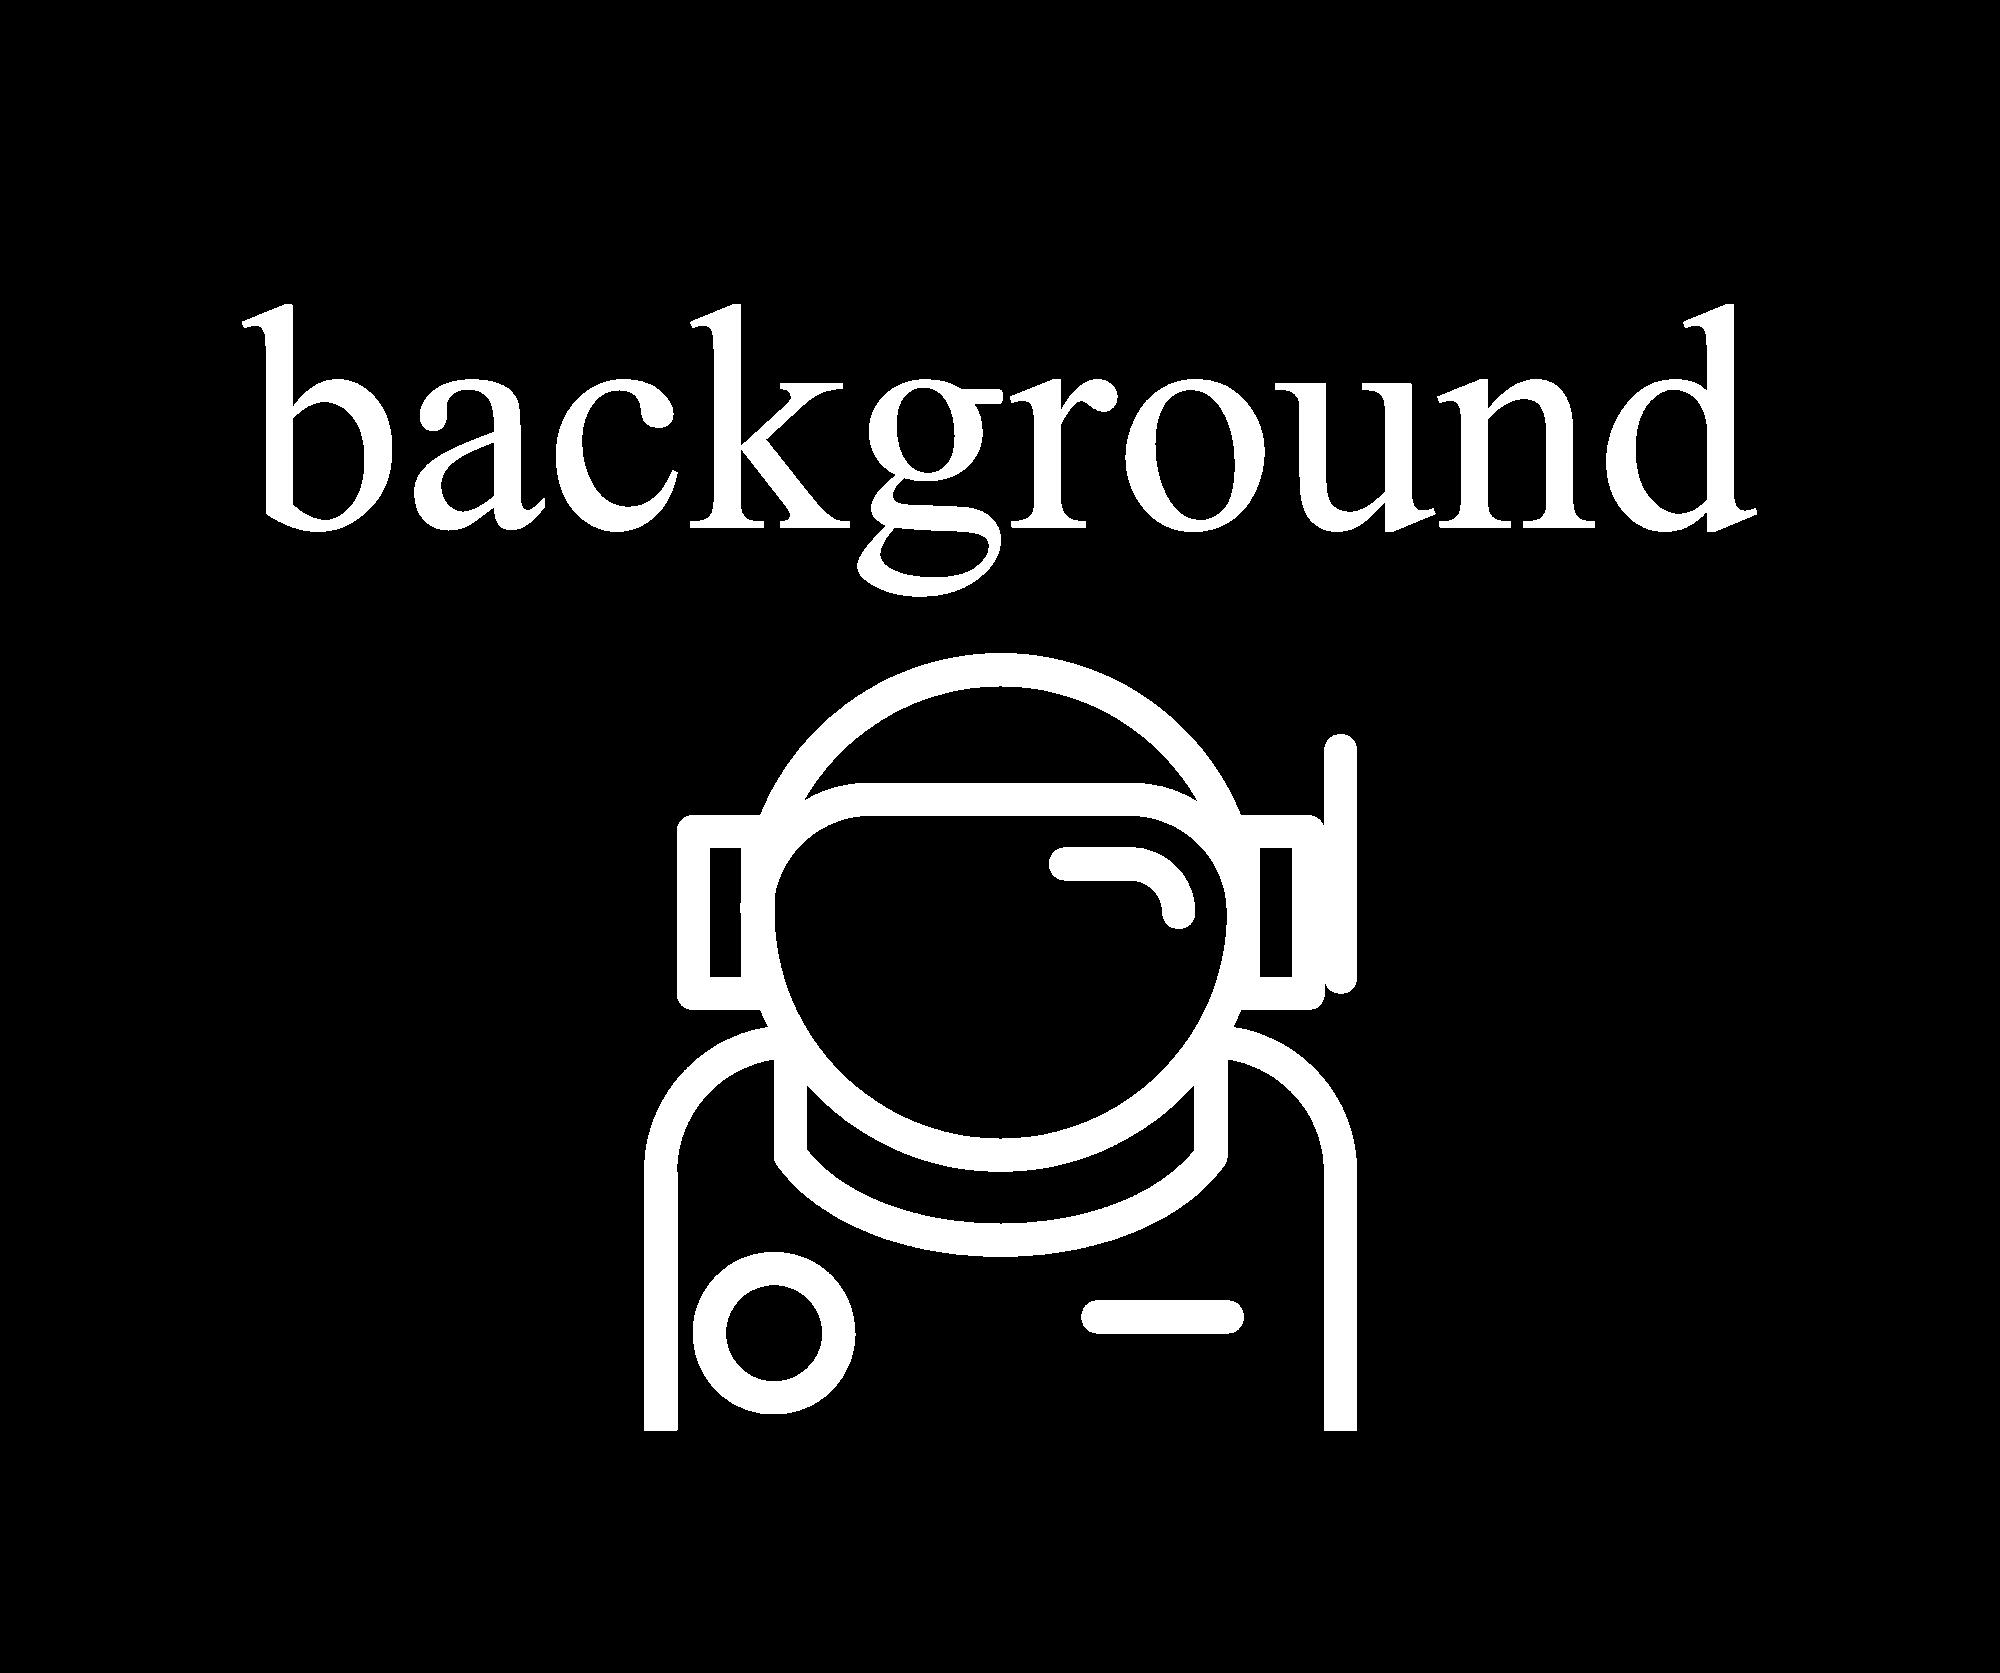 background-logo-white (1).png